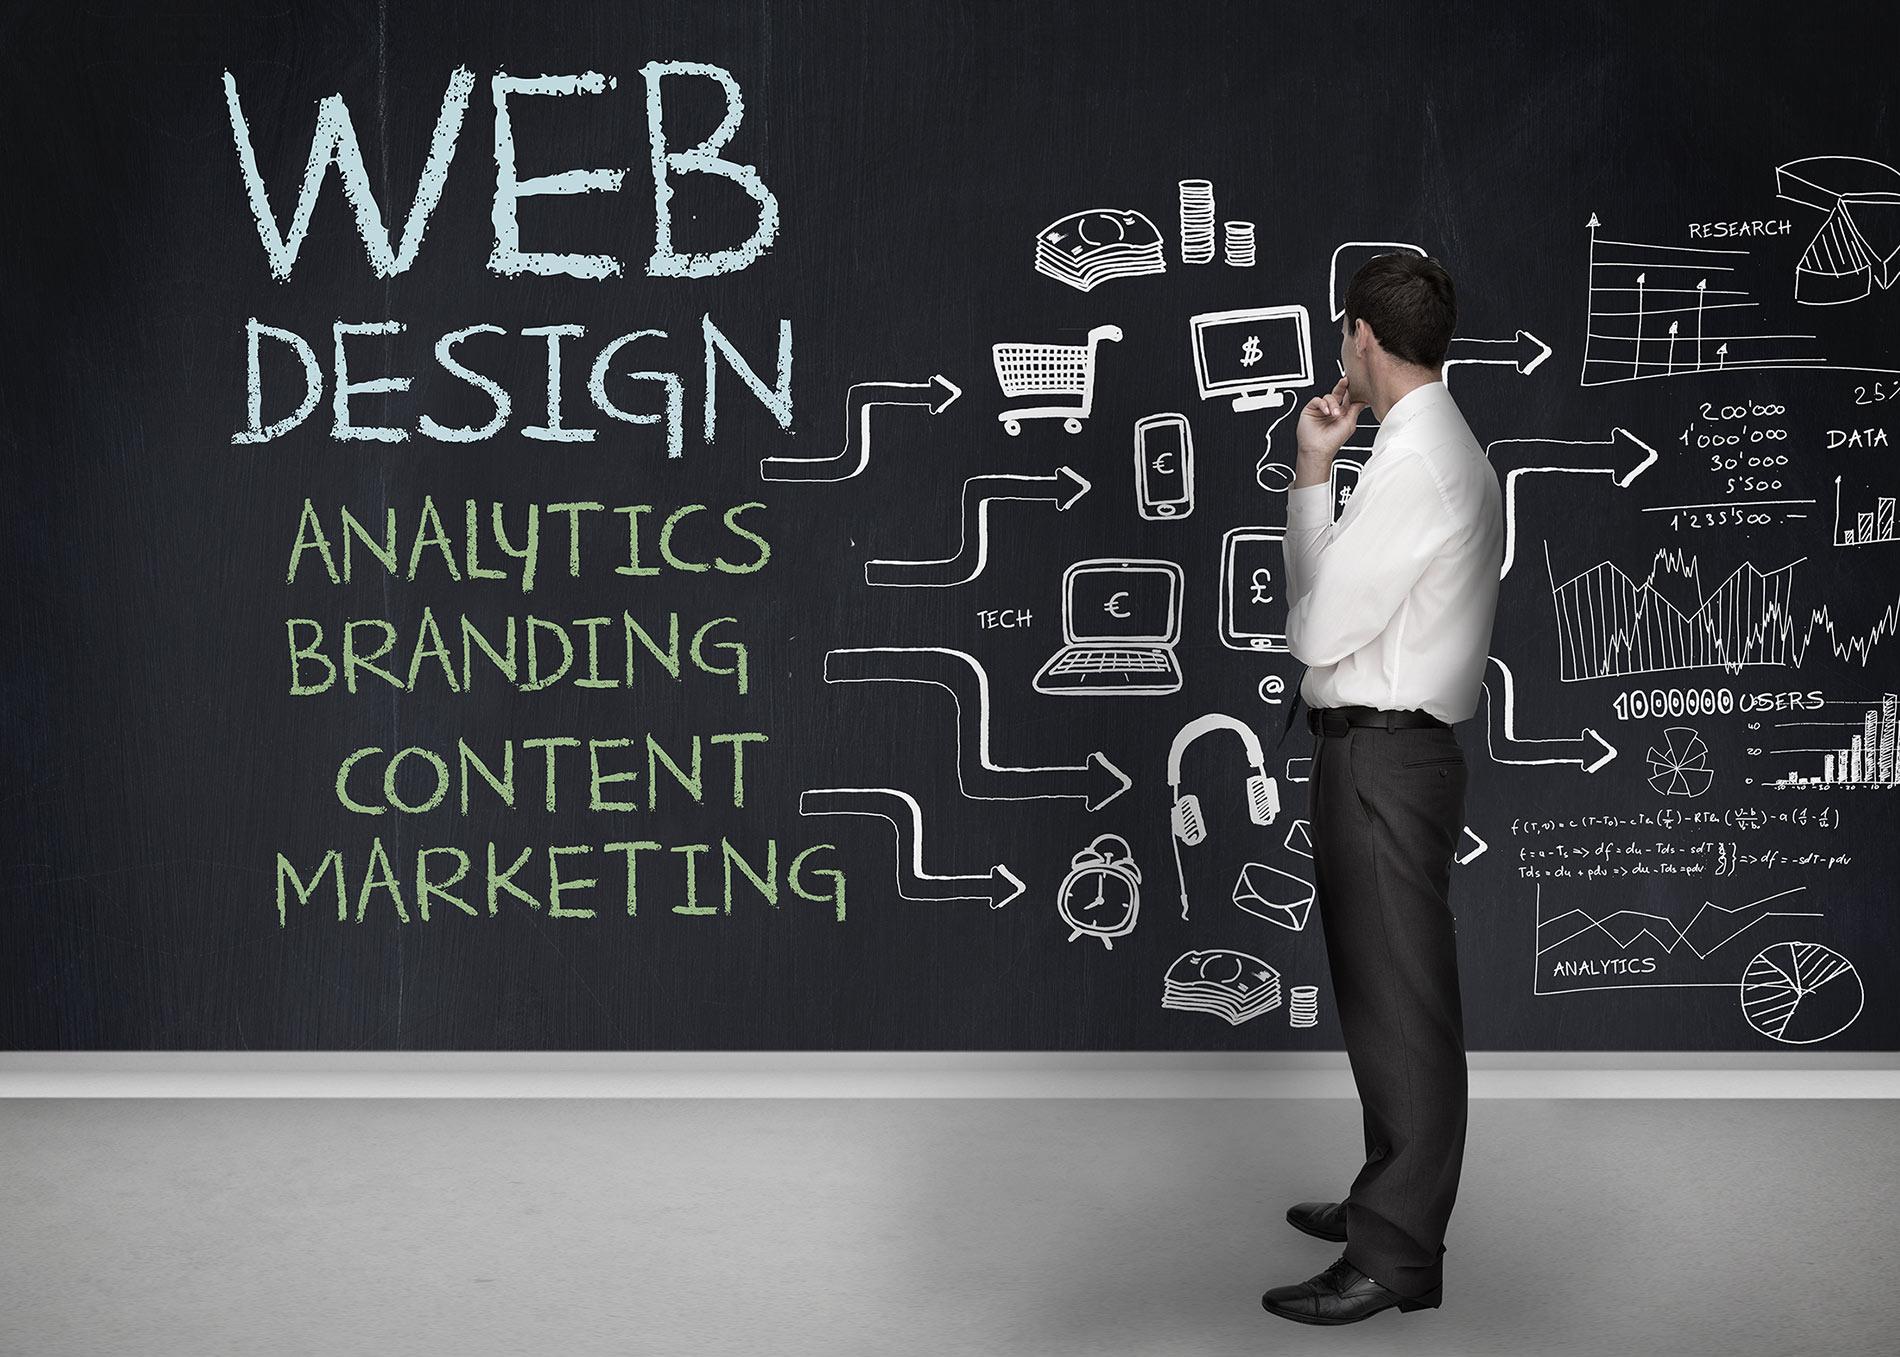 Professional Web Design Calgary